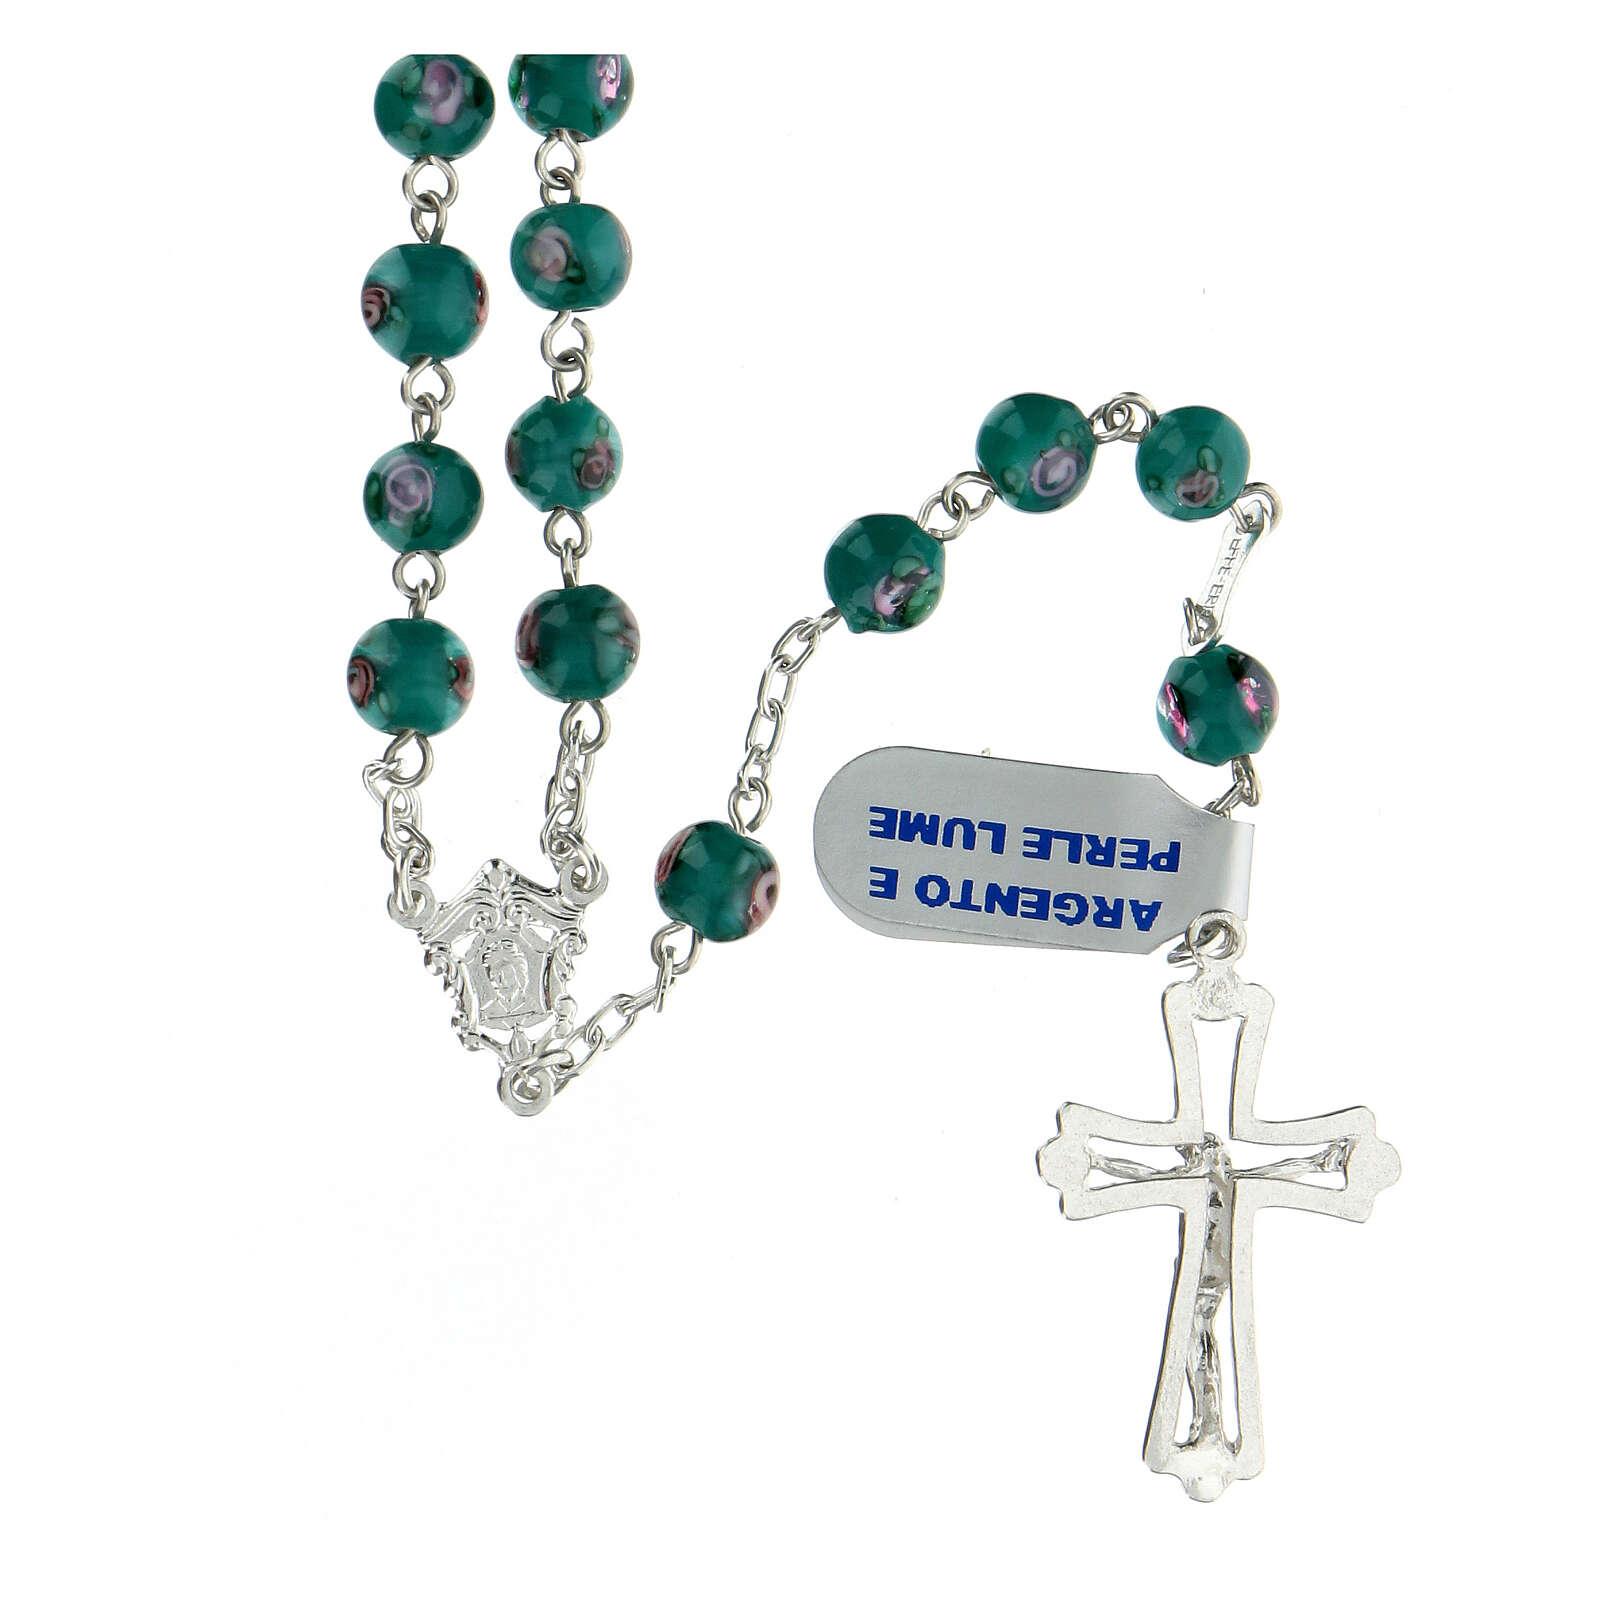 Rosario argento 925 grani perle al lume verde 6 mm rose croce traforata 4